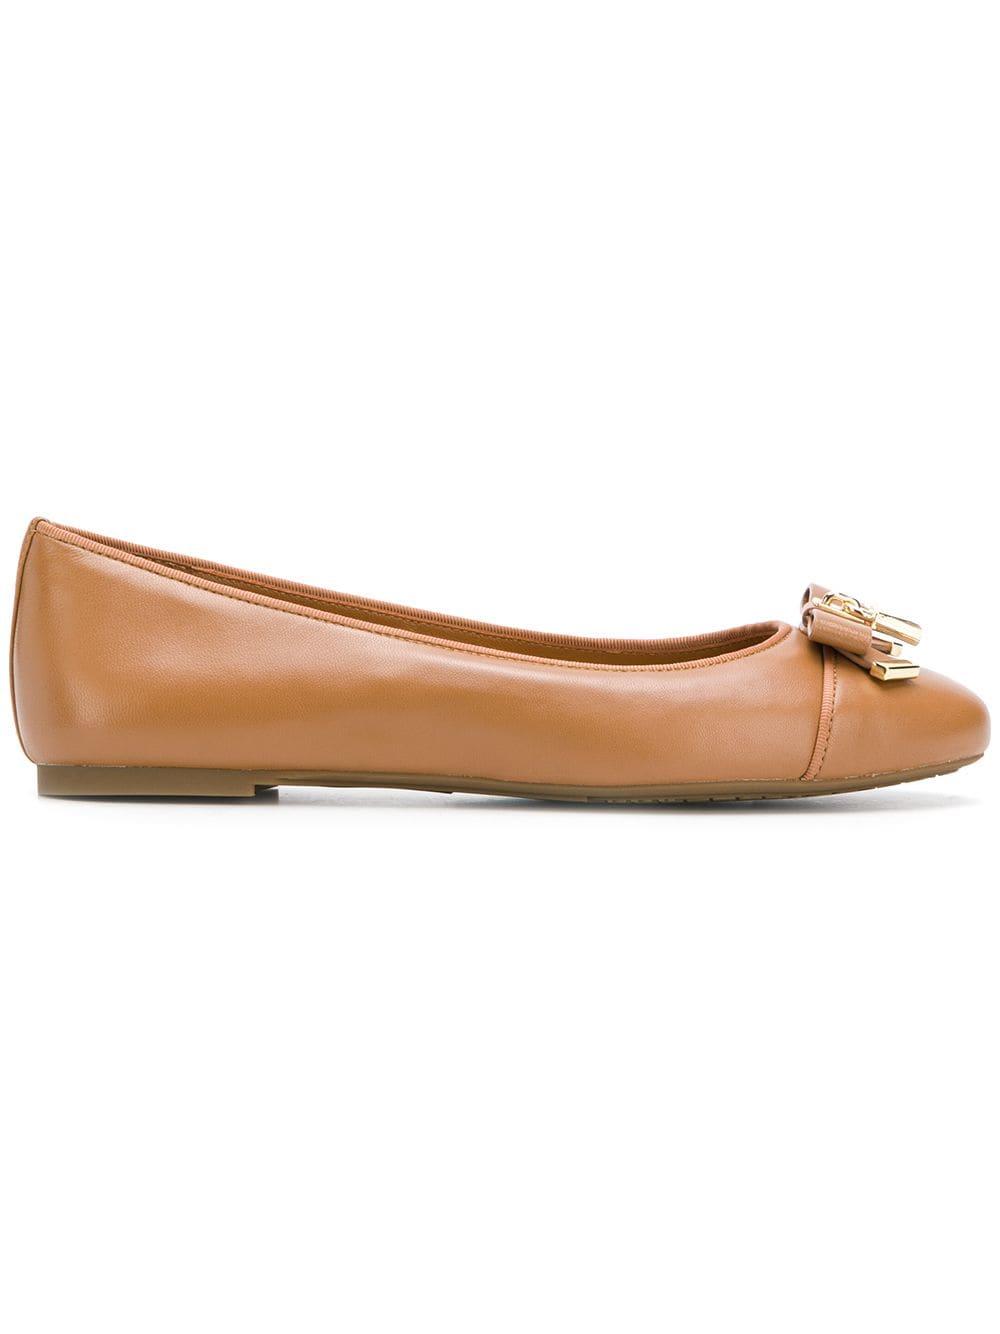 Michael Michael Kors Alice ballerina shoes - Brown - Glami.cz 661b4b76b25